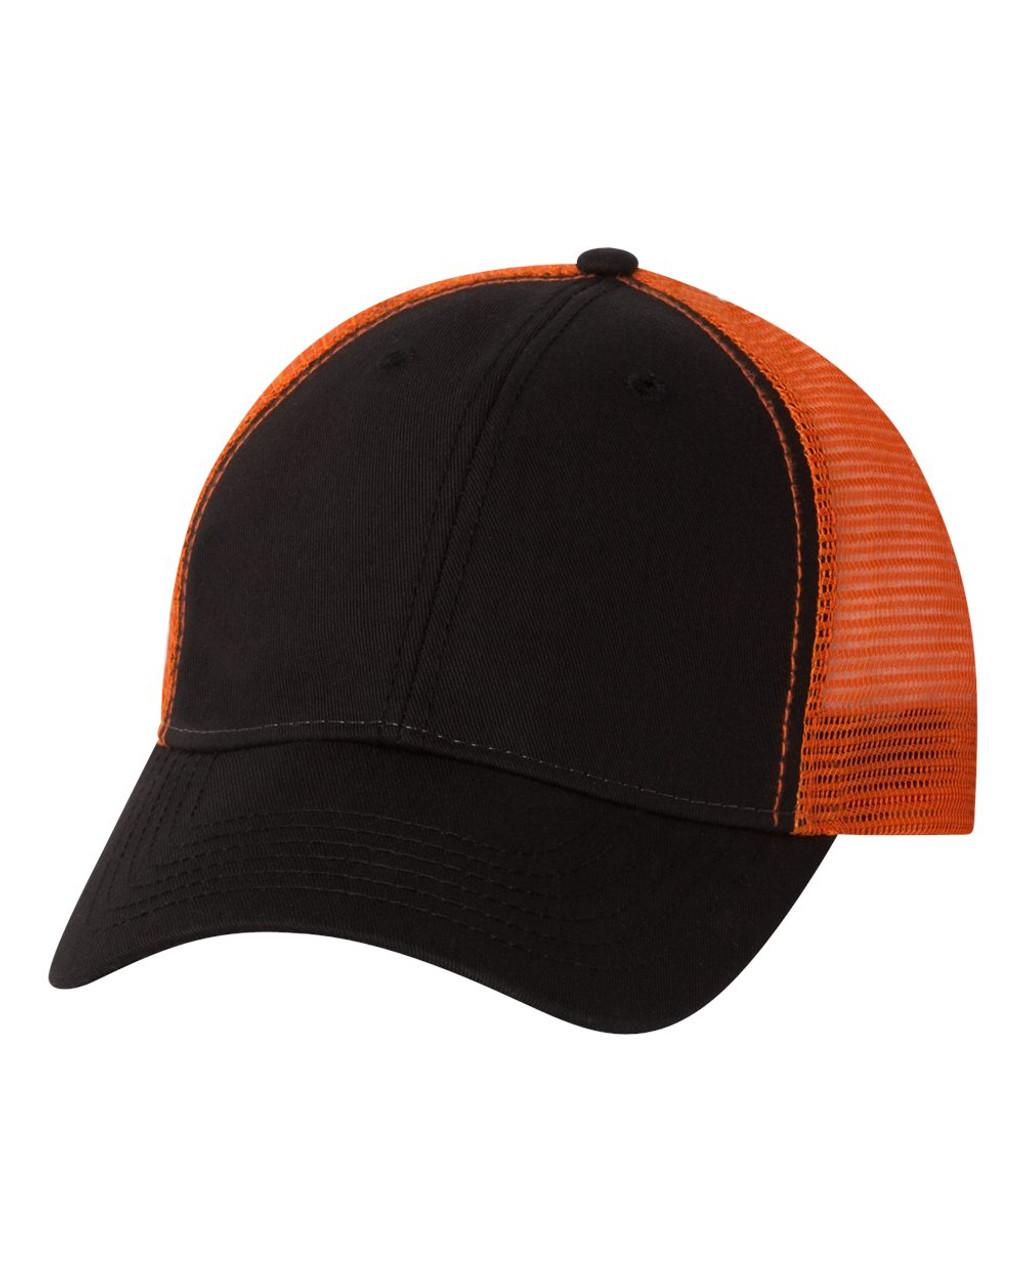 Black/Orange - AH80 Sportsman Washed Trucker Cap | T-shirt.ca